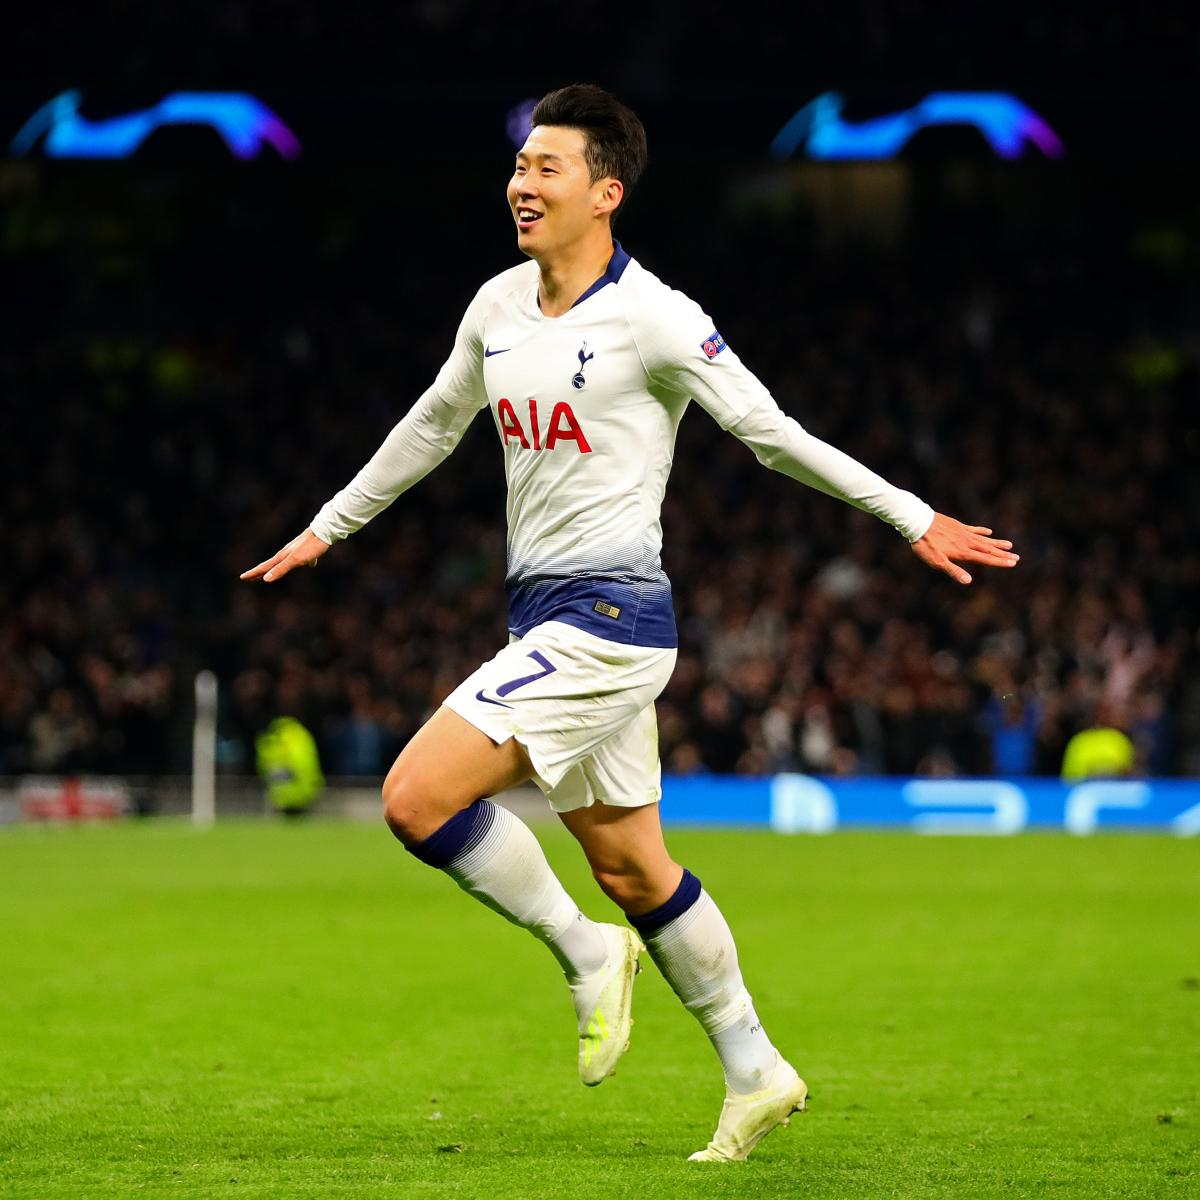 Tottenham Vs Ajax Odds Live Stream And Tv Info For Ucl: Manchester City Vs. Tottenham: Odds, Live Stream, TV Info